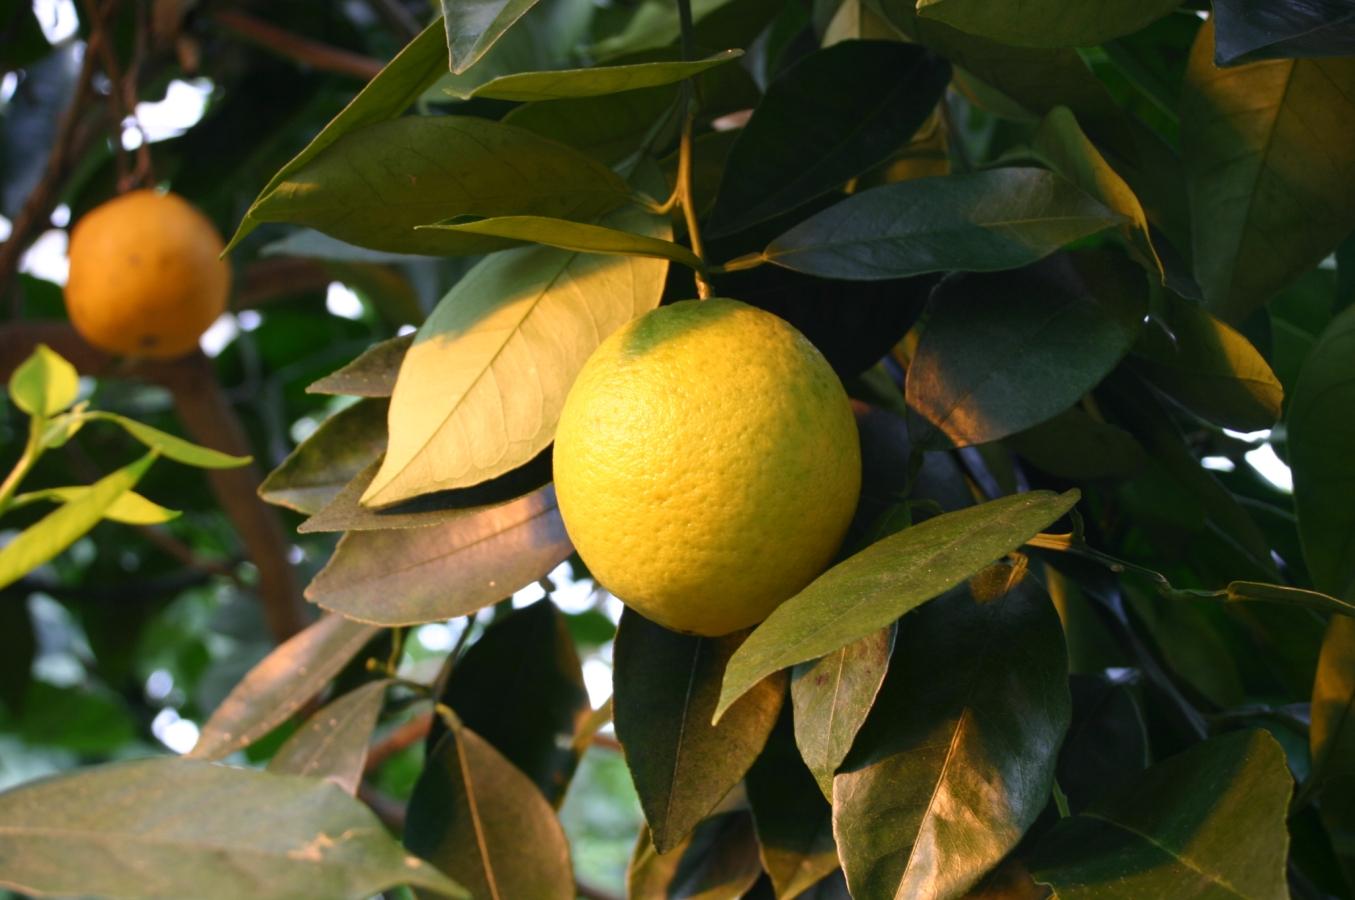 Citrus Sinensis Distribution File:citrus-sinensis-fruit.jpg